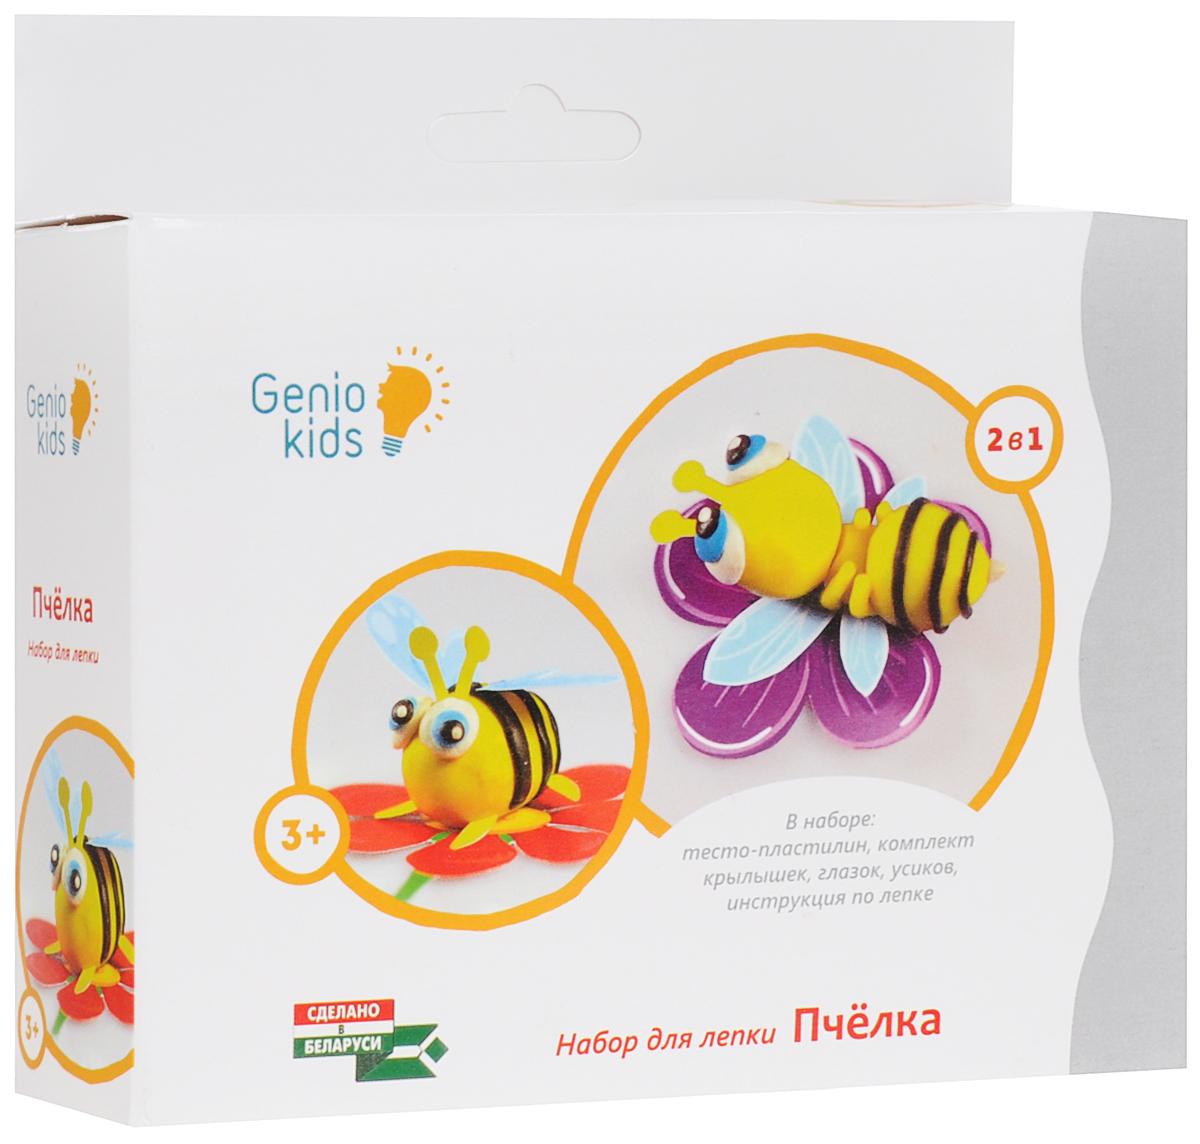 Genio Kids Набор для лепки Пчелка